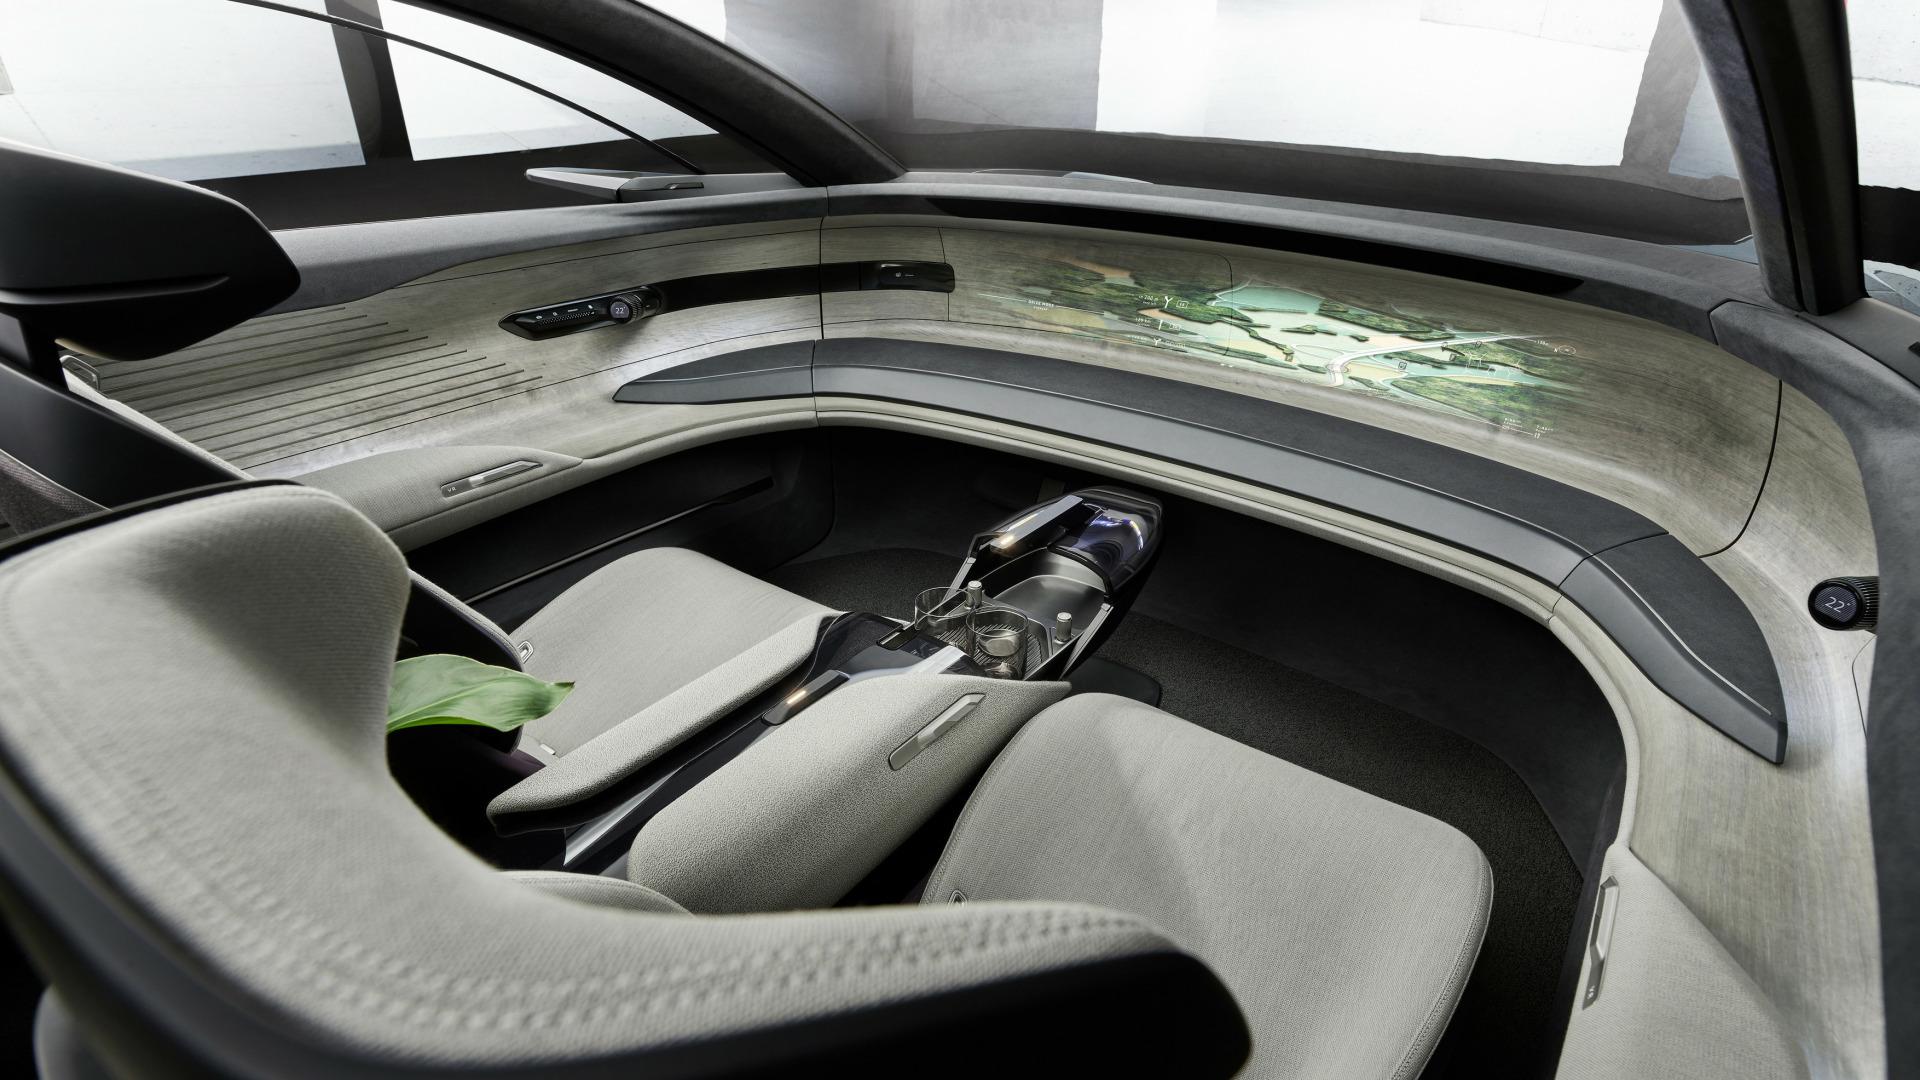 Video, Werbespot, Elektroautos, Bilder, Konzept, Audi, Luxus, Limousine, Grandsphere concept, Concept, Grandsphere, Luxuslimousine